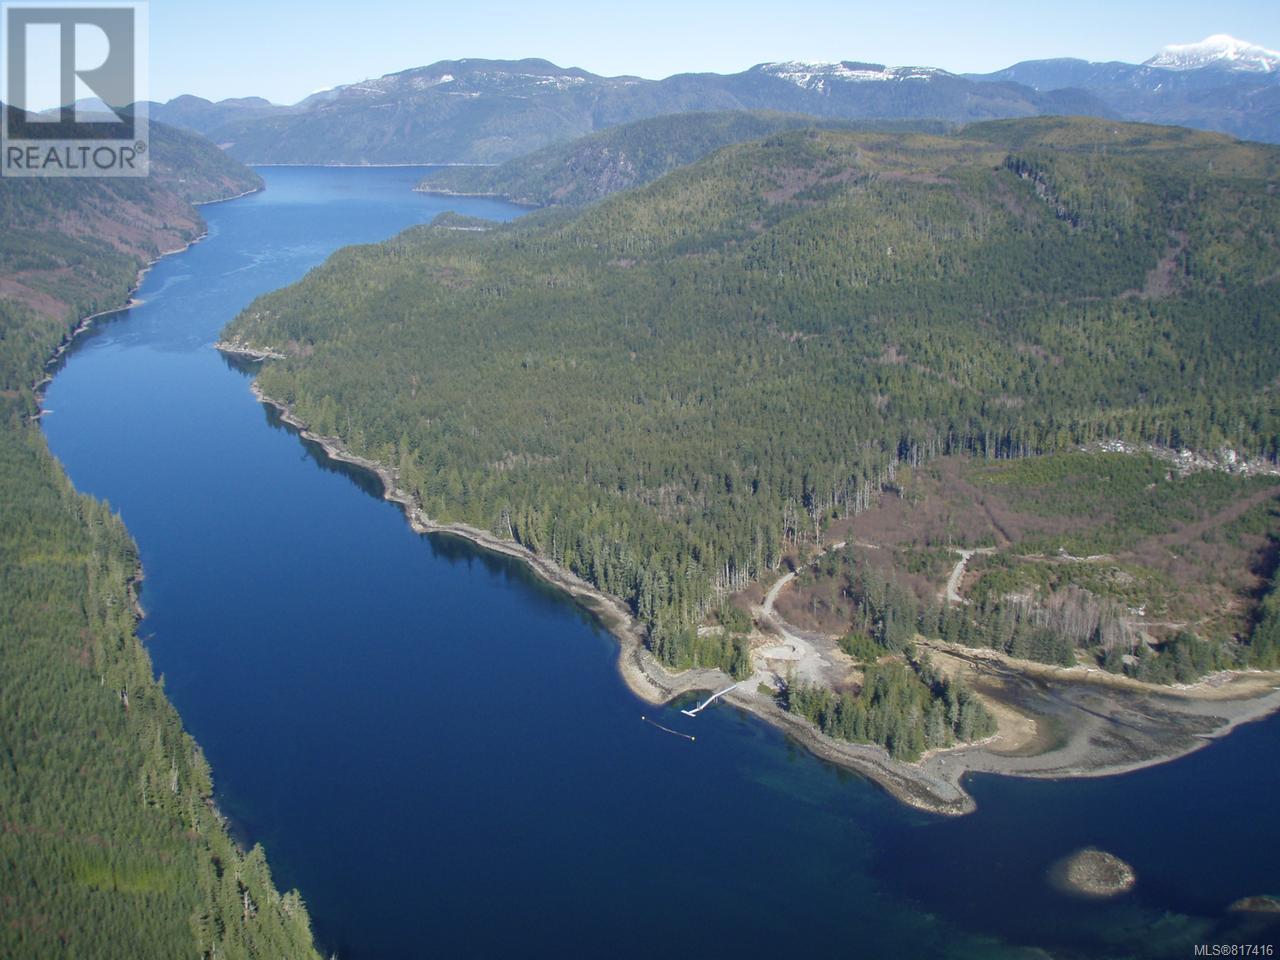 SL F Chatham Channel, none, British Columbia